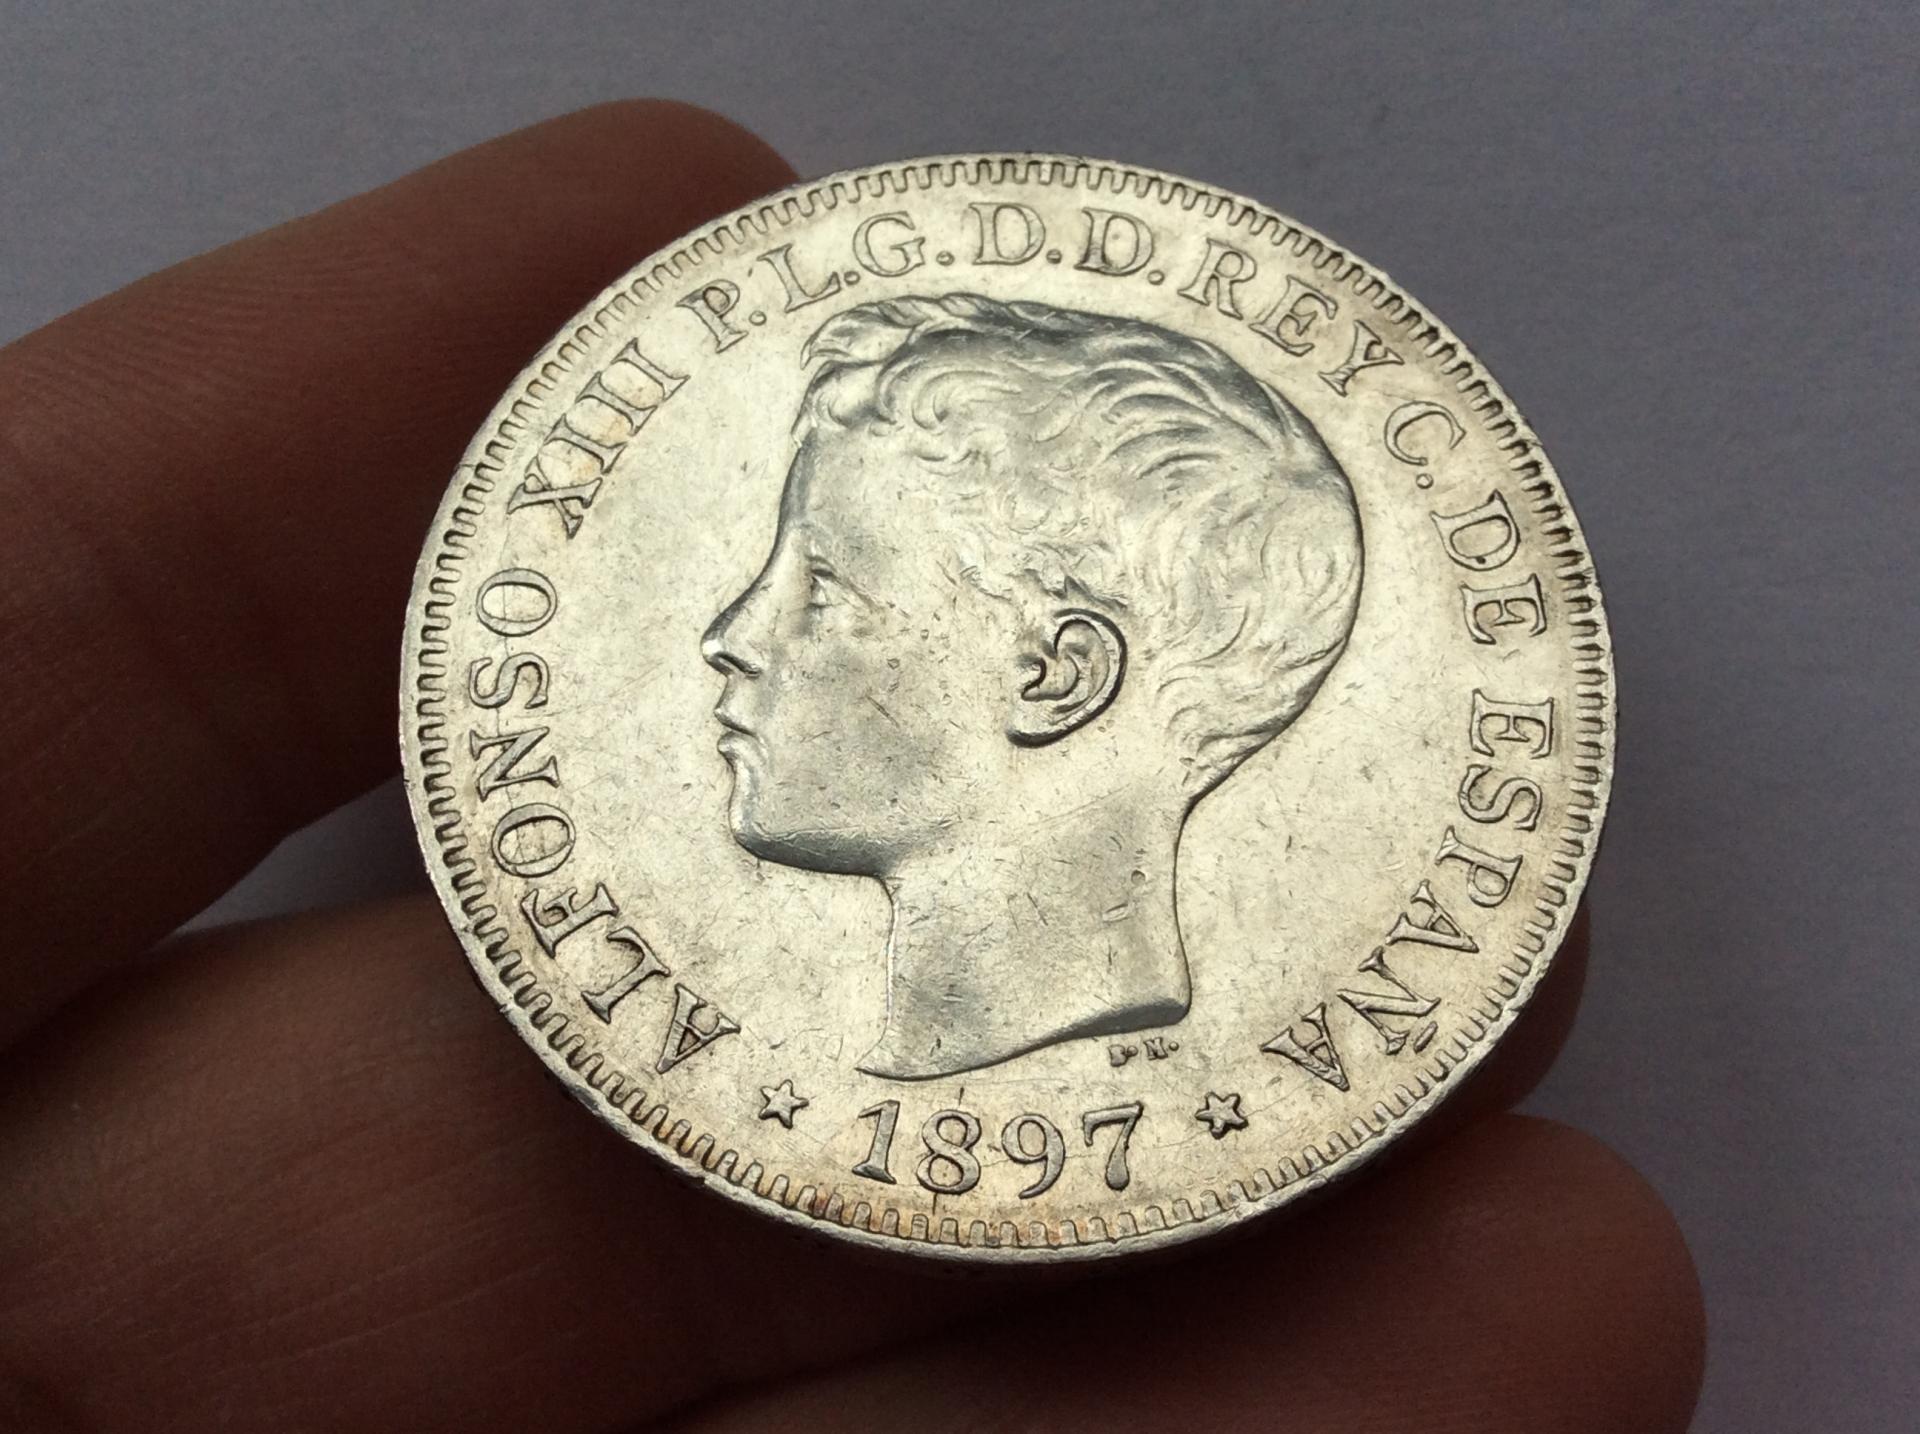 1 PESO PLATA 1897 - ISLAS FILIPINAS - ALFONSO XIII